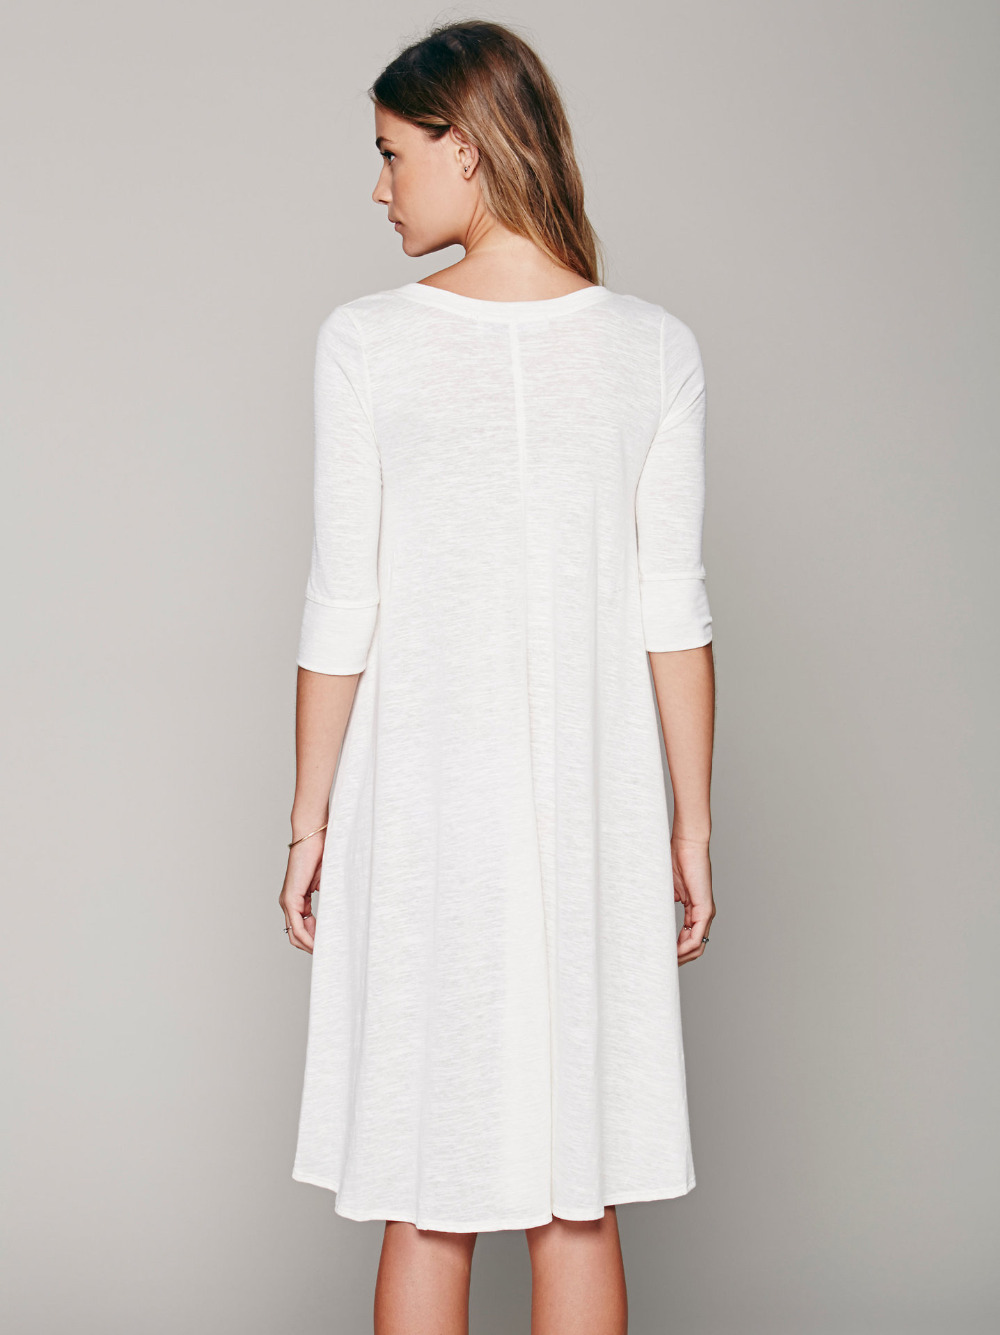 5e64df55353 Summer Dresses For Juniors Cheap - Gomes Weine AG